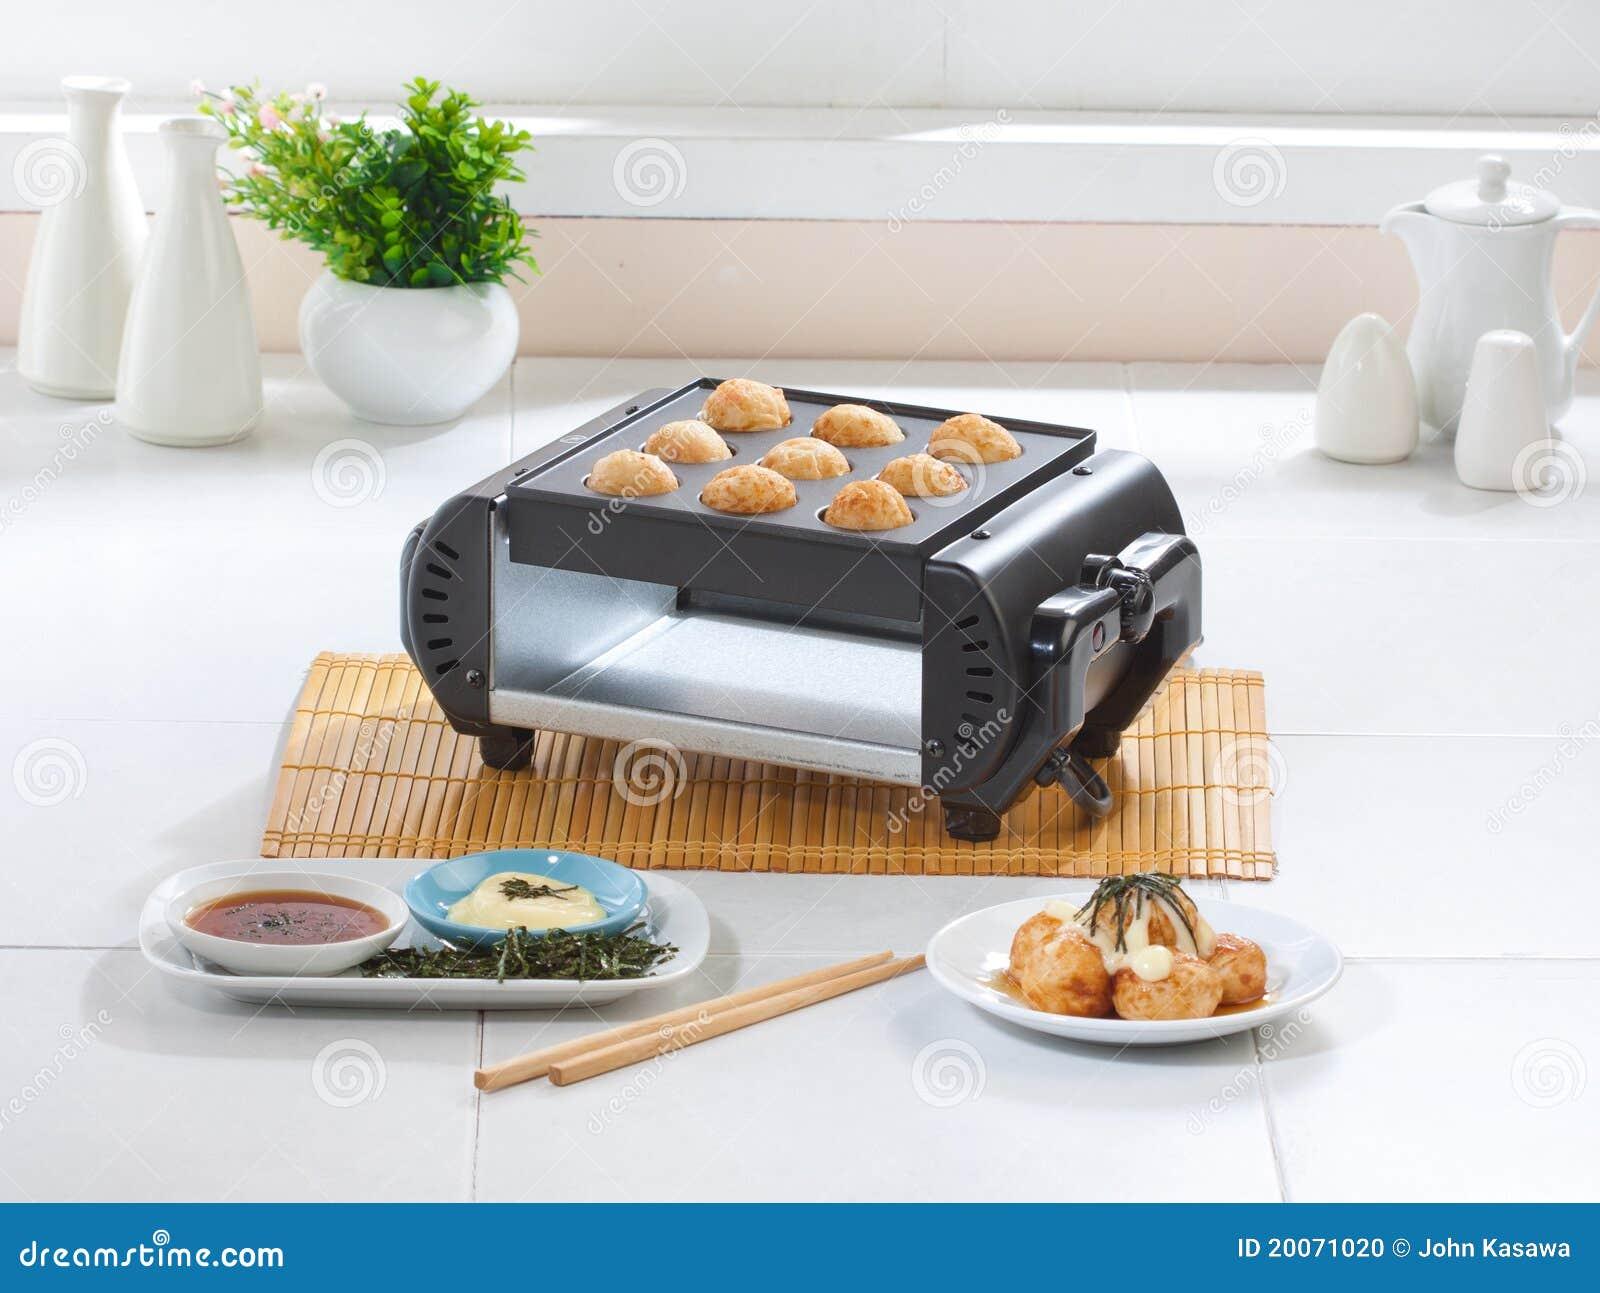 Takoyaki japanese food maker stove in the kitchen stock for Cuisine generator